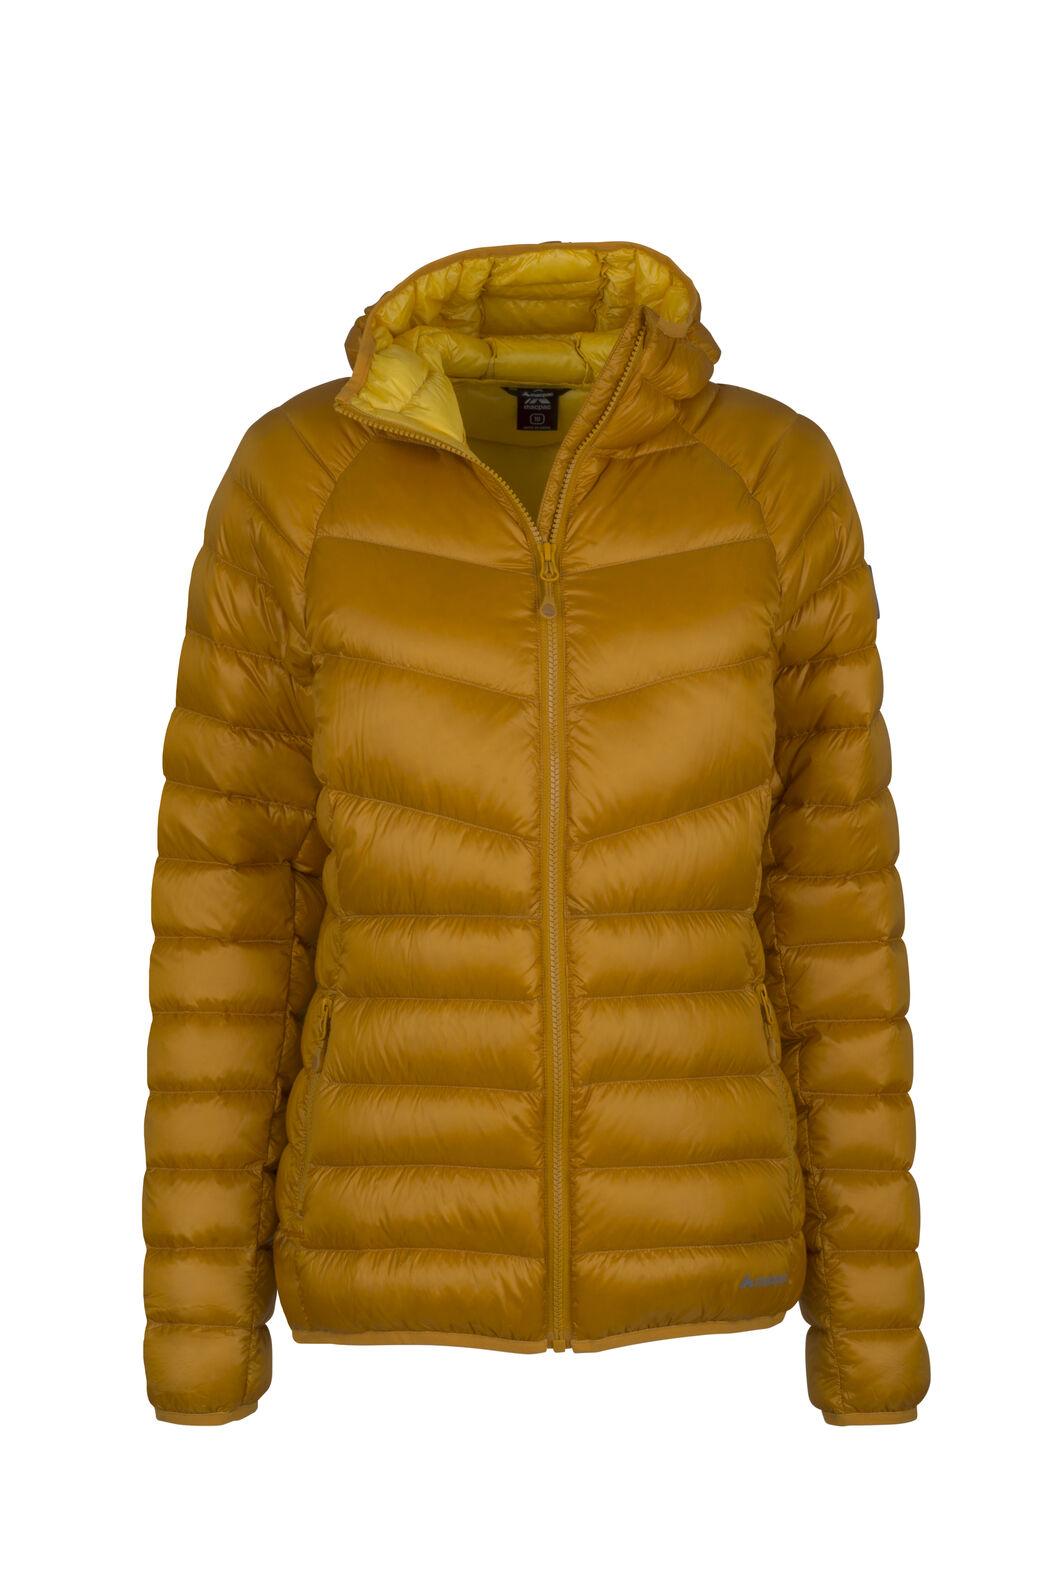 Macpac Mercury Down Jacket - Women's, Golden Yellow, hi-res